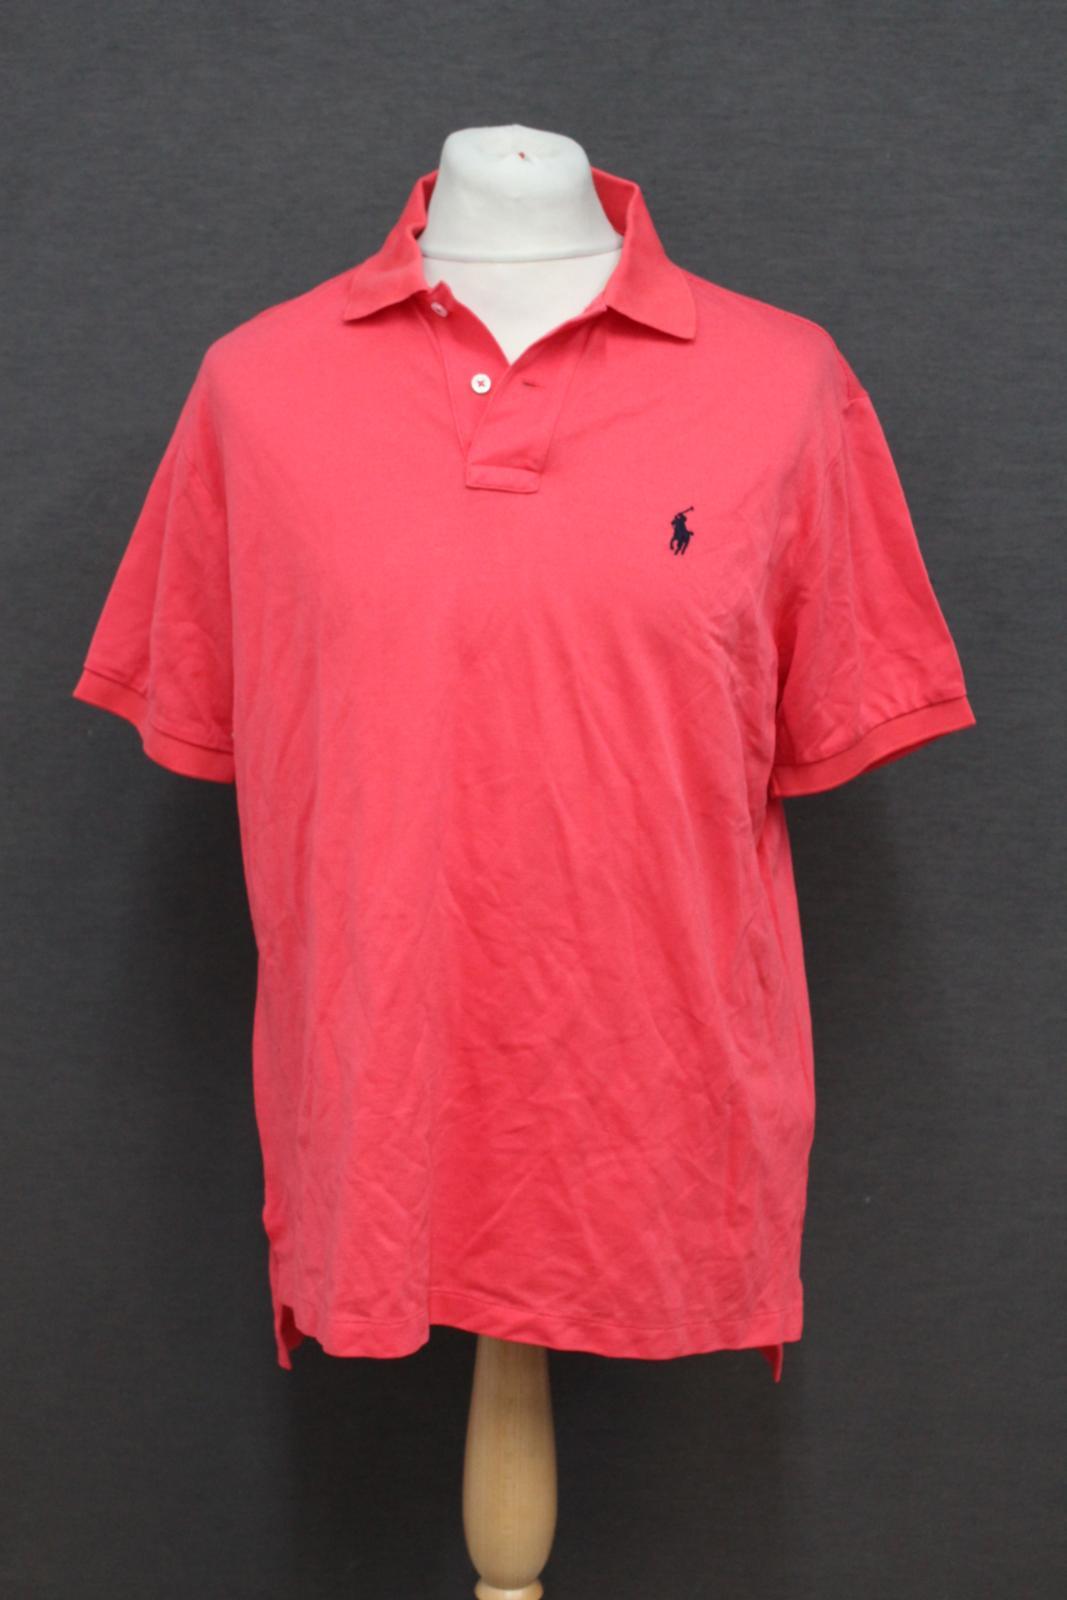 Ralph-Lauren-Polo-para-hombre-de-color-rosa-de-algodon-Manga-Corta-Camisa-Polo-De-Ajuste miniatura 11